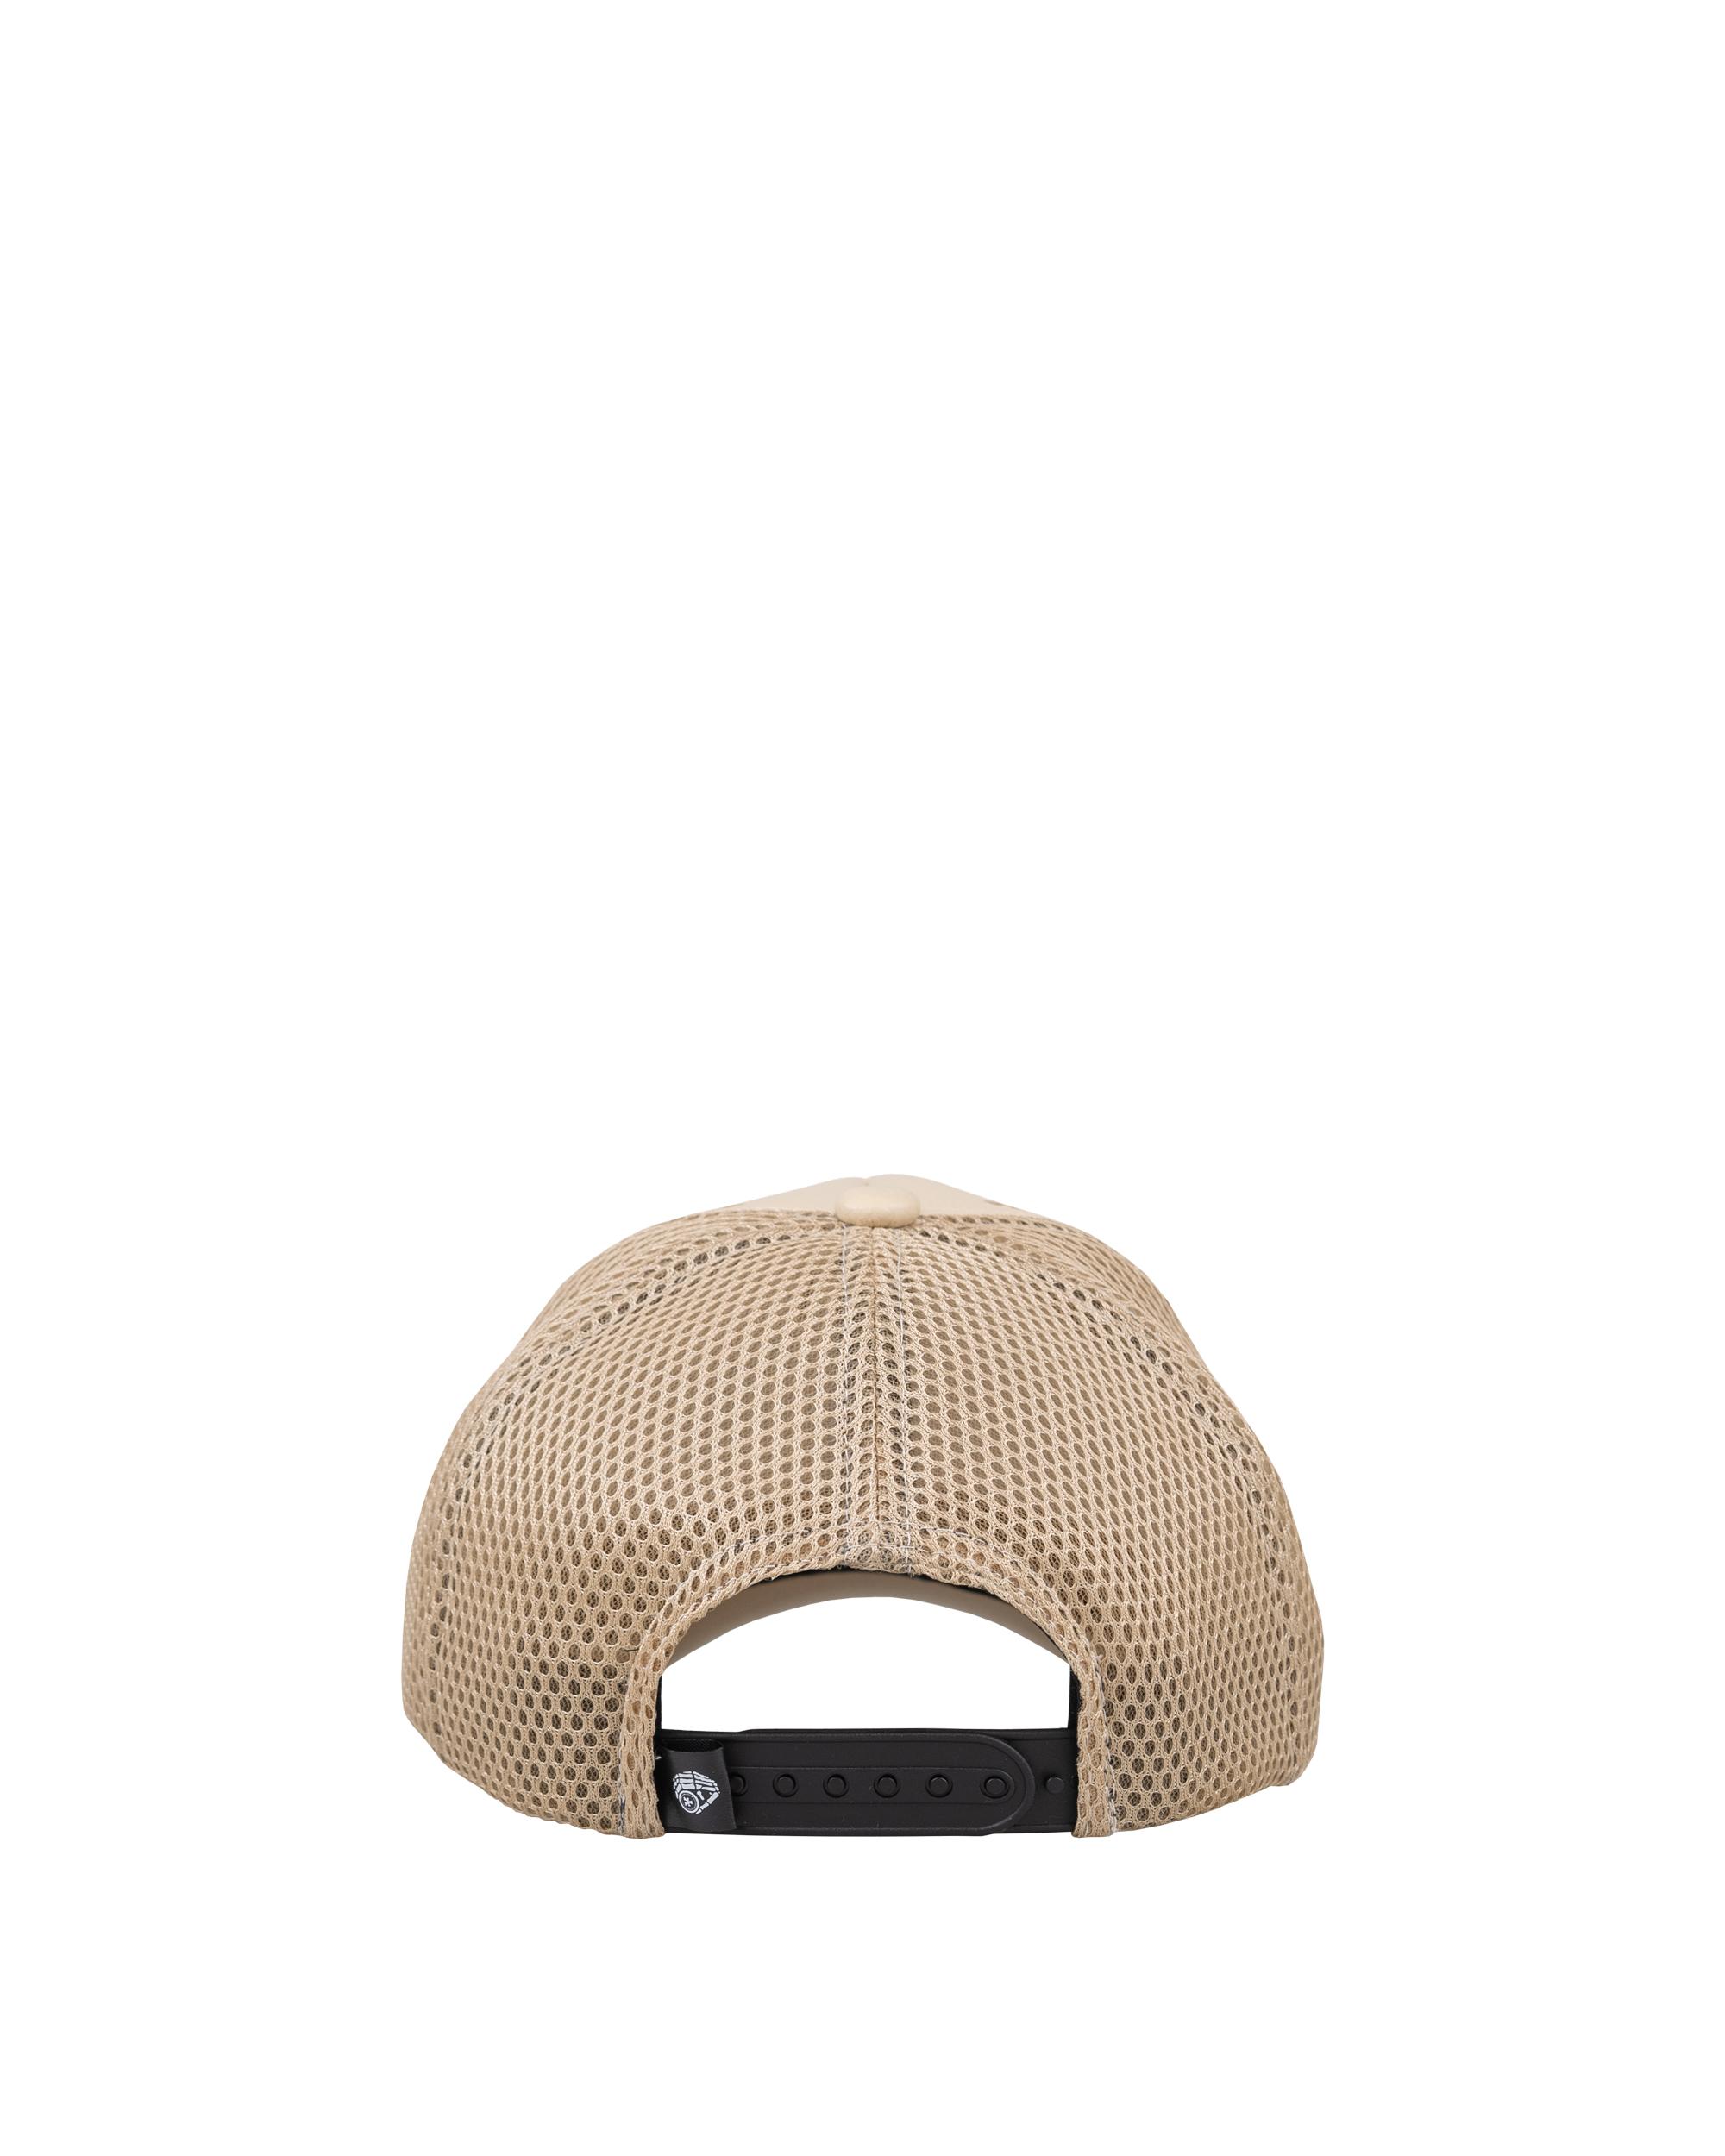 DirtyCoins Leather Trucker Hat